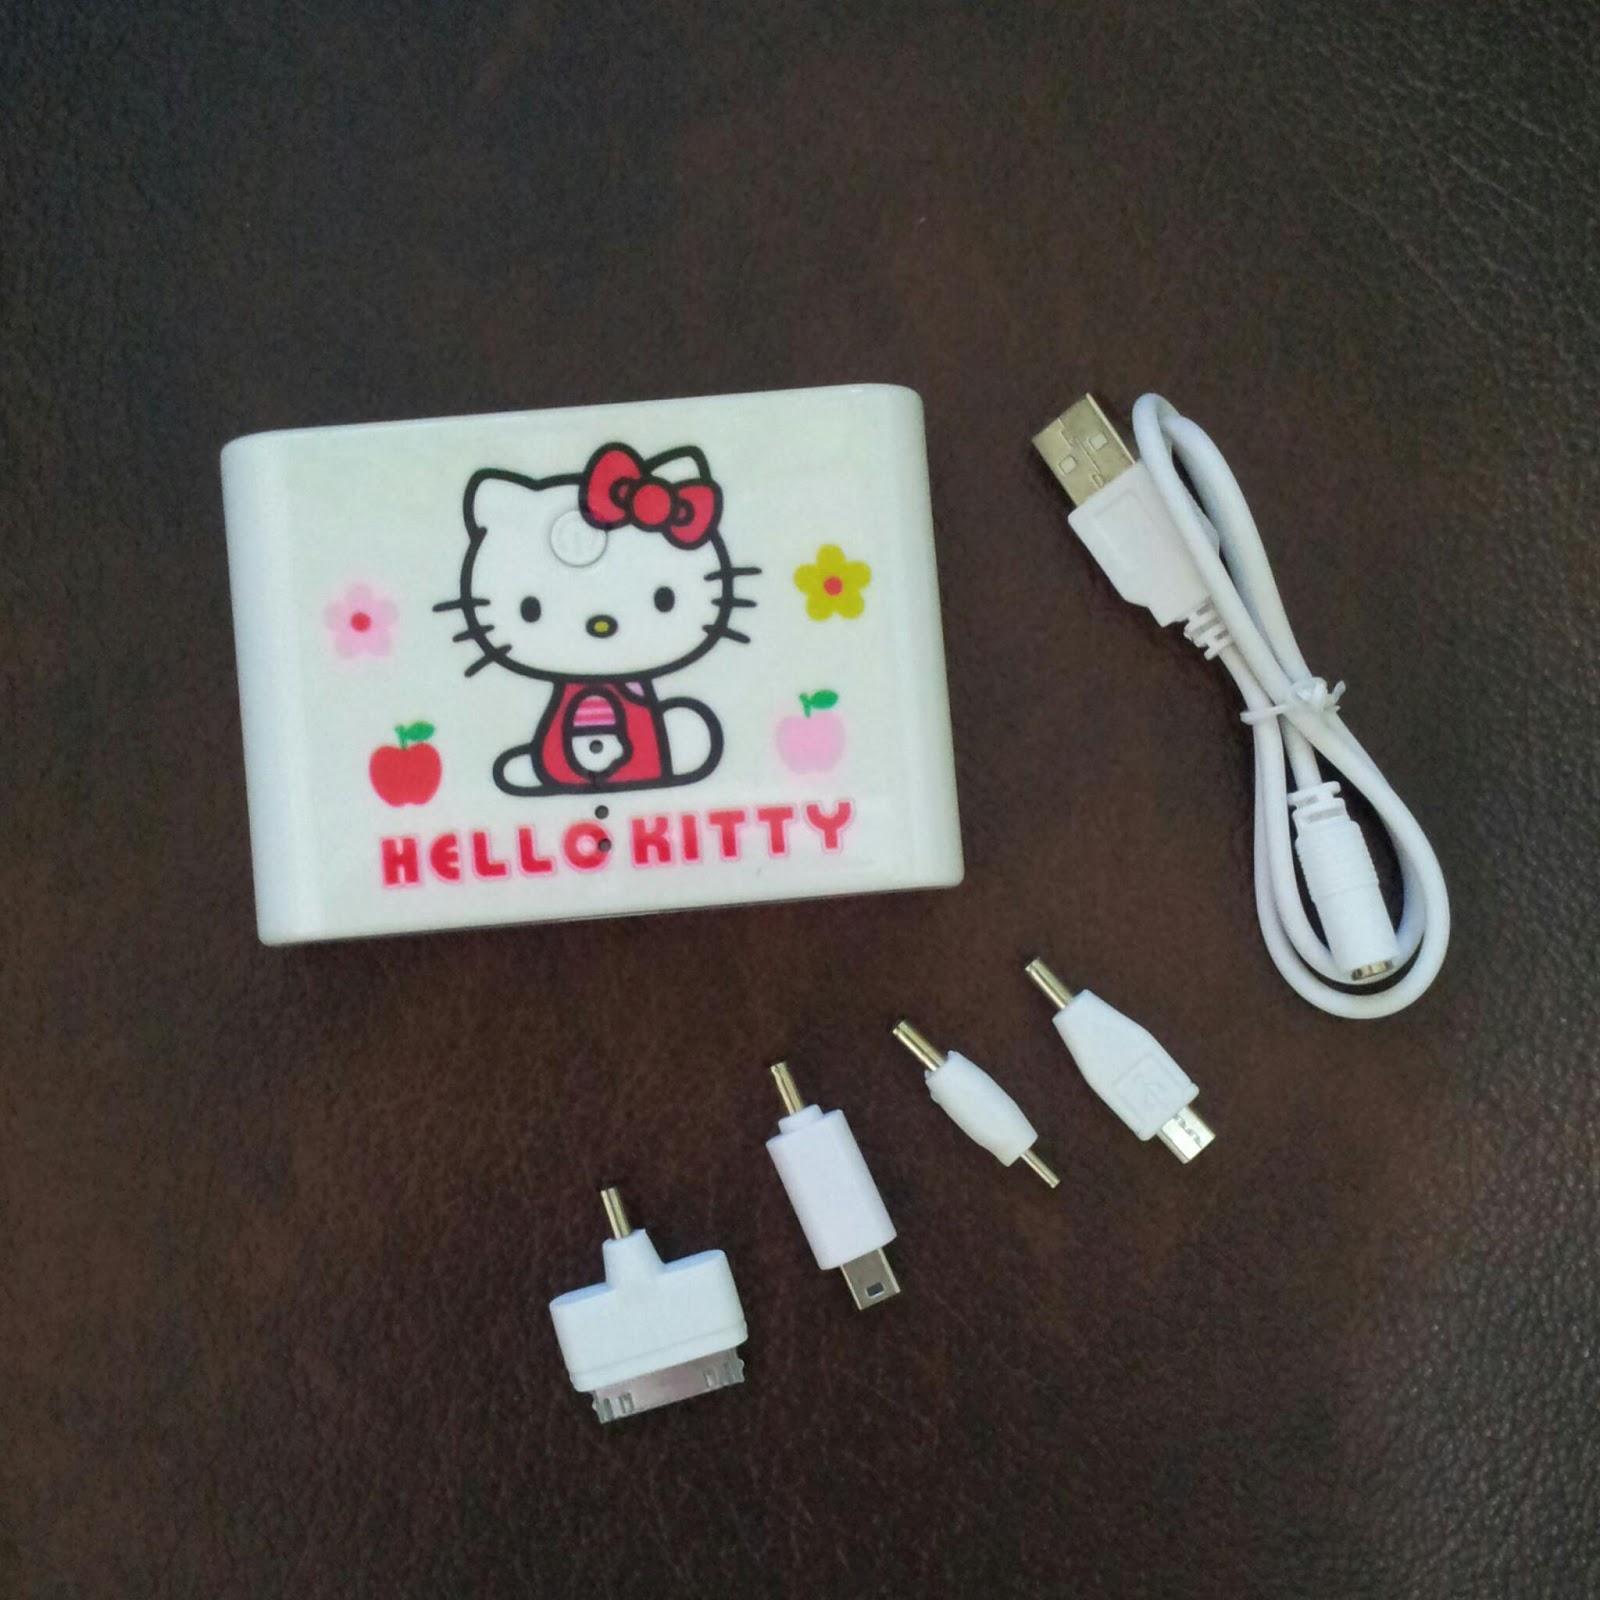 Jual Powerbank Hello Kitty Murah Grosir Ecer 12000 Mah